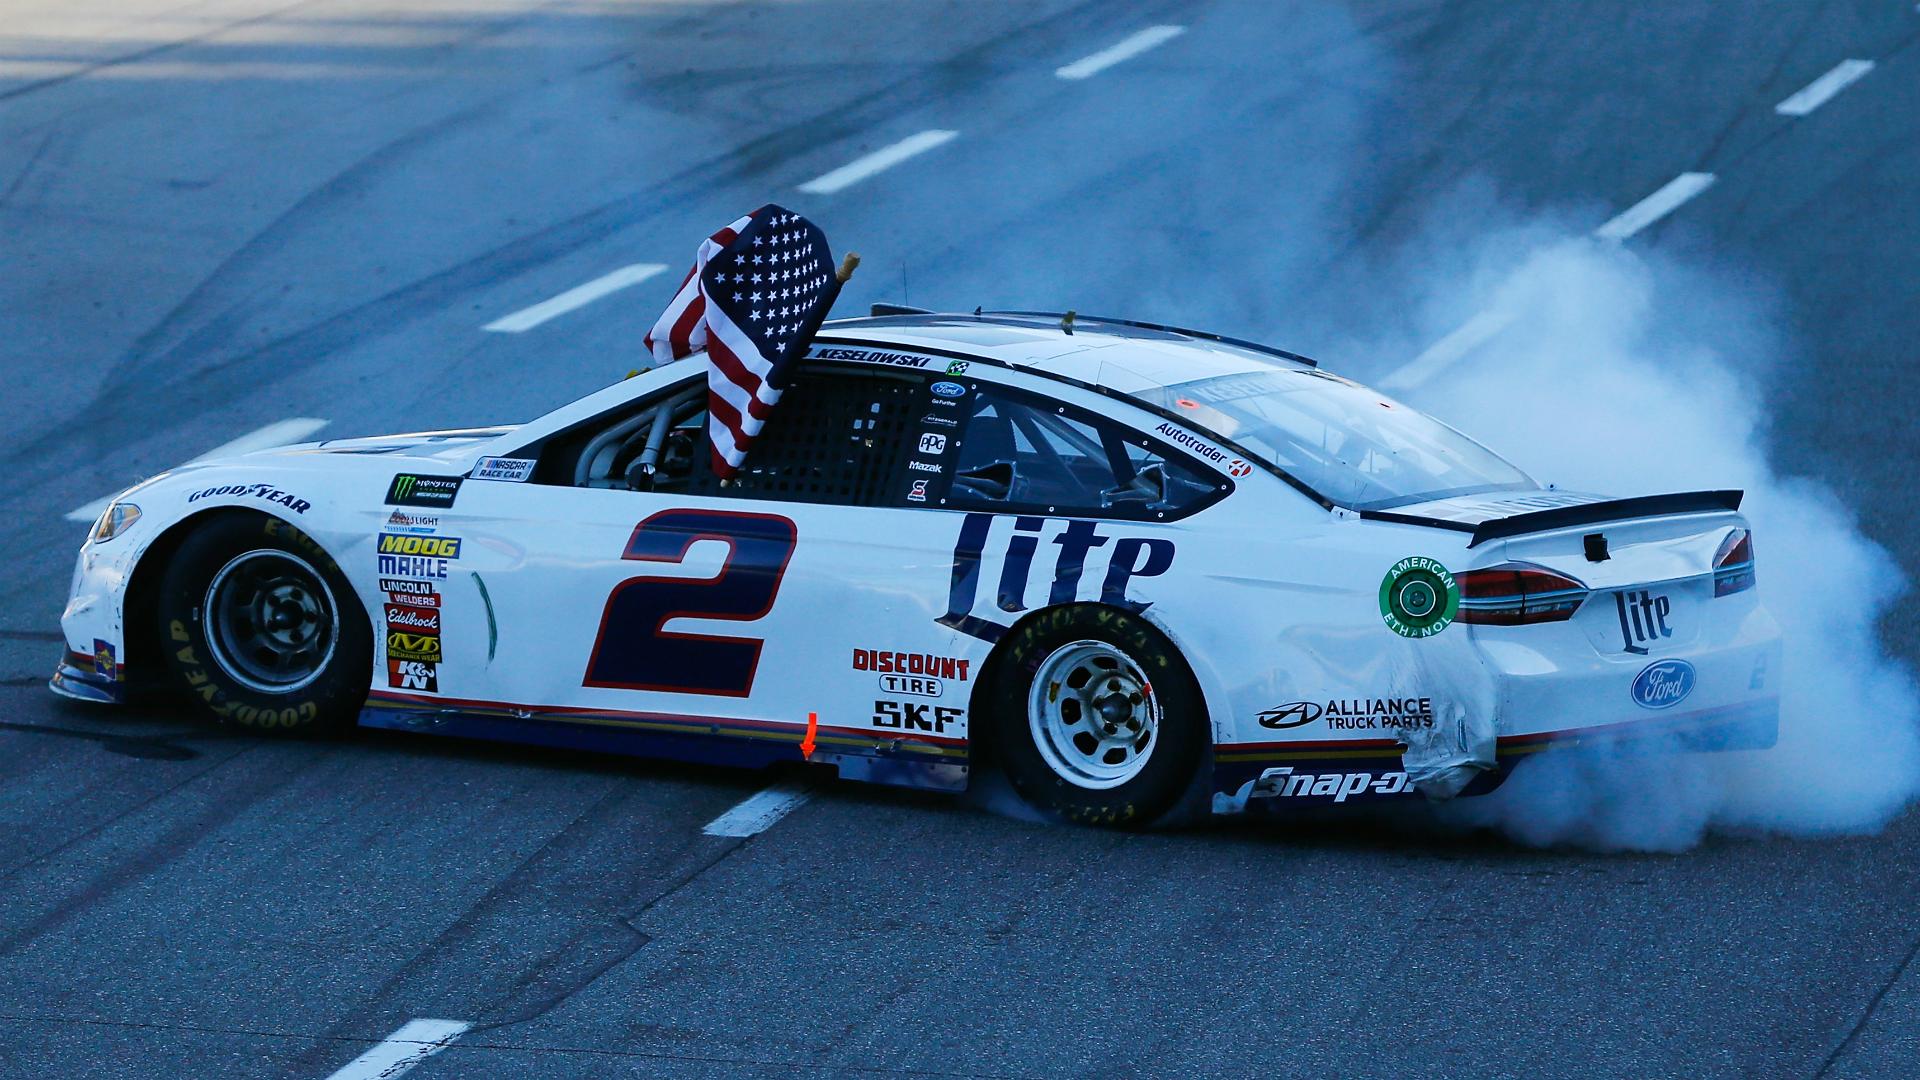 NASCAR results at Talladega: Brad Keselowski avoids carnage, wins on last-lap pass